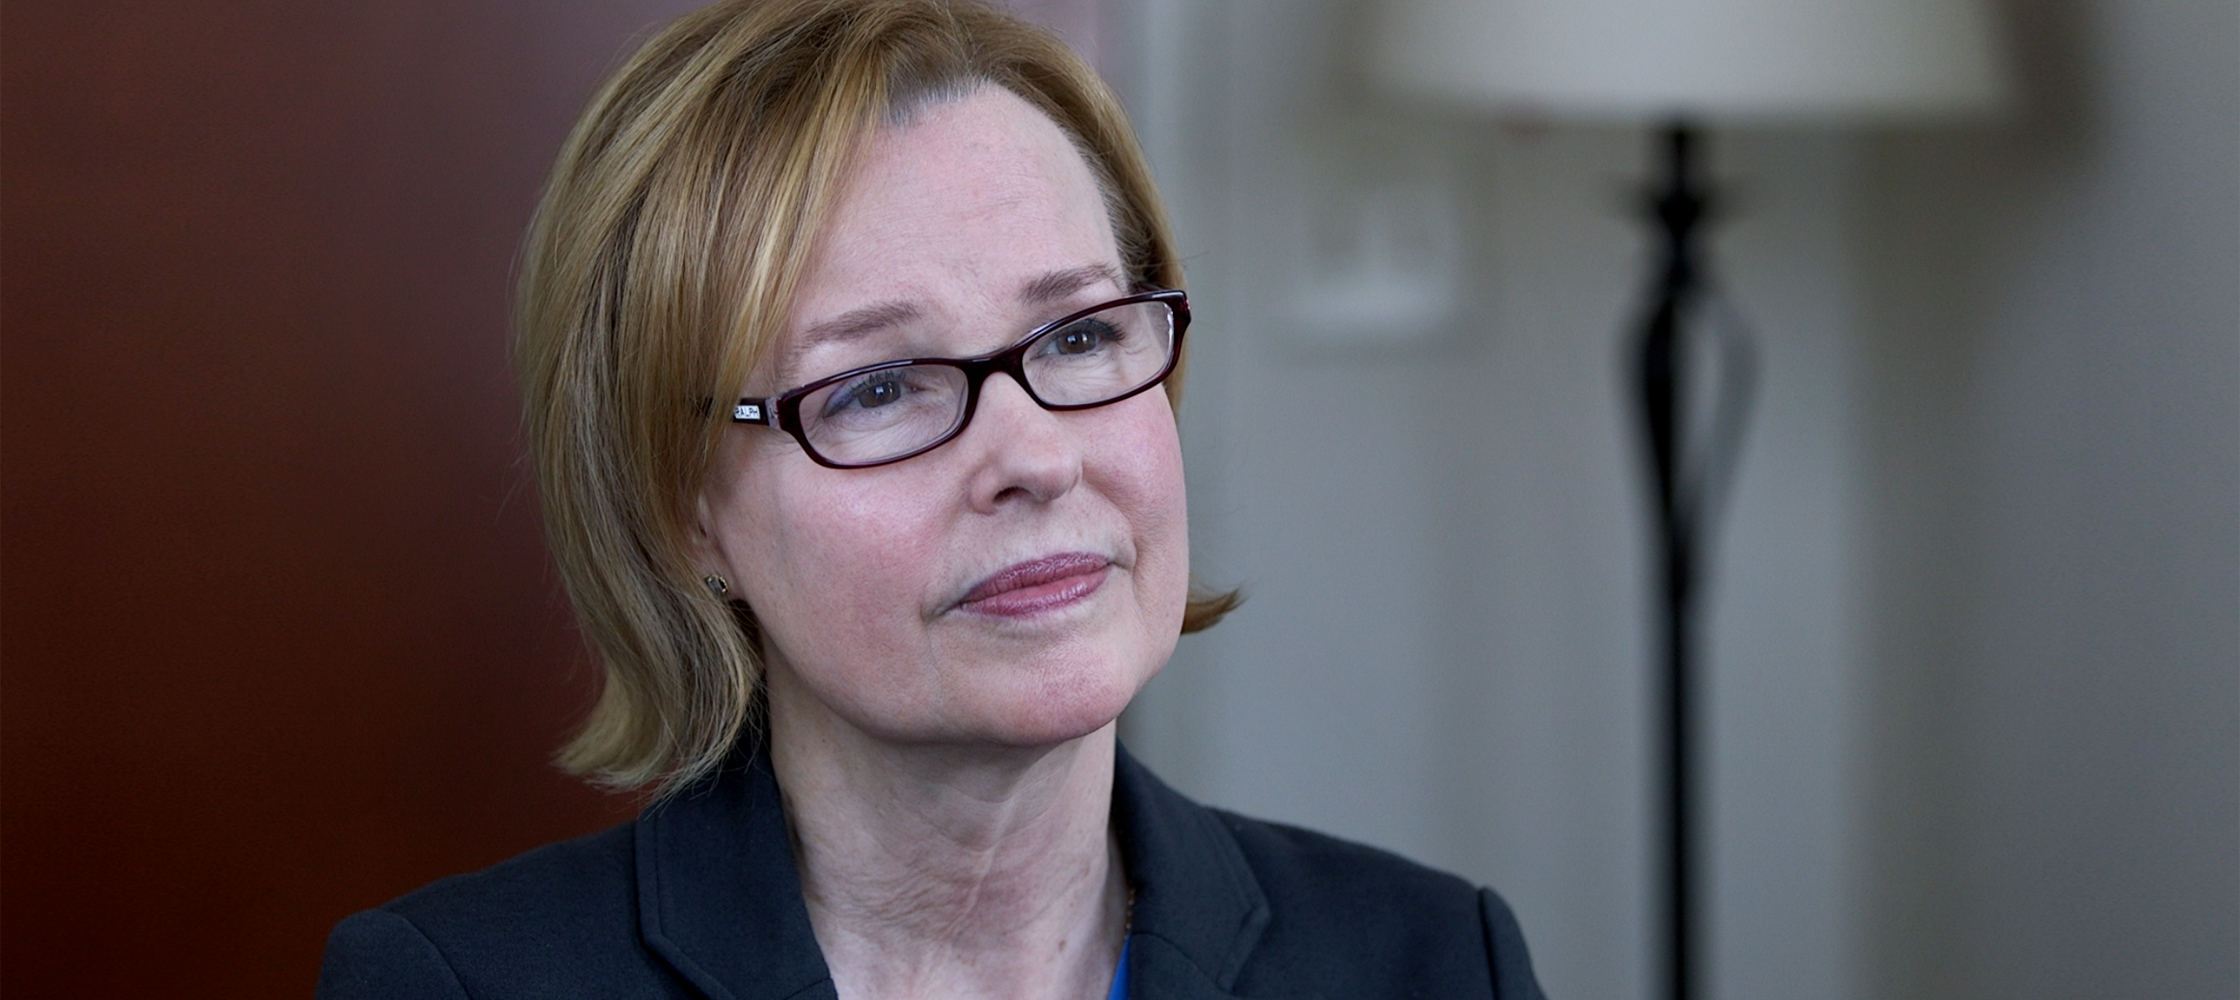 Geraldine Dawson, PhD, autism researcher at Duke